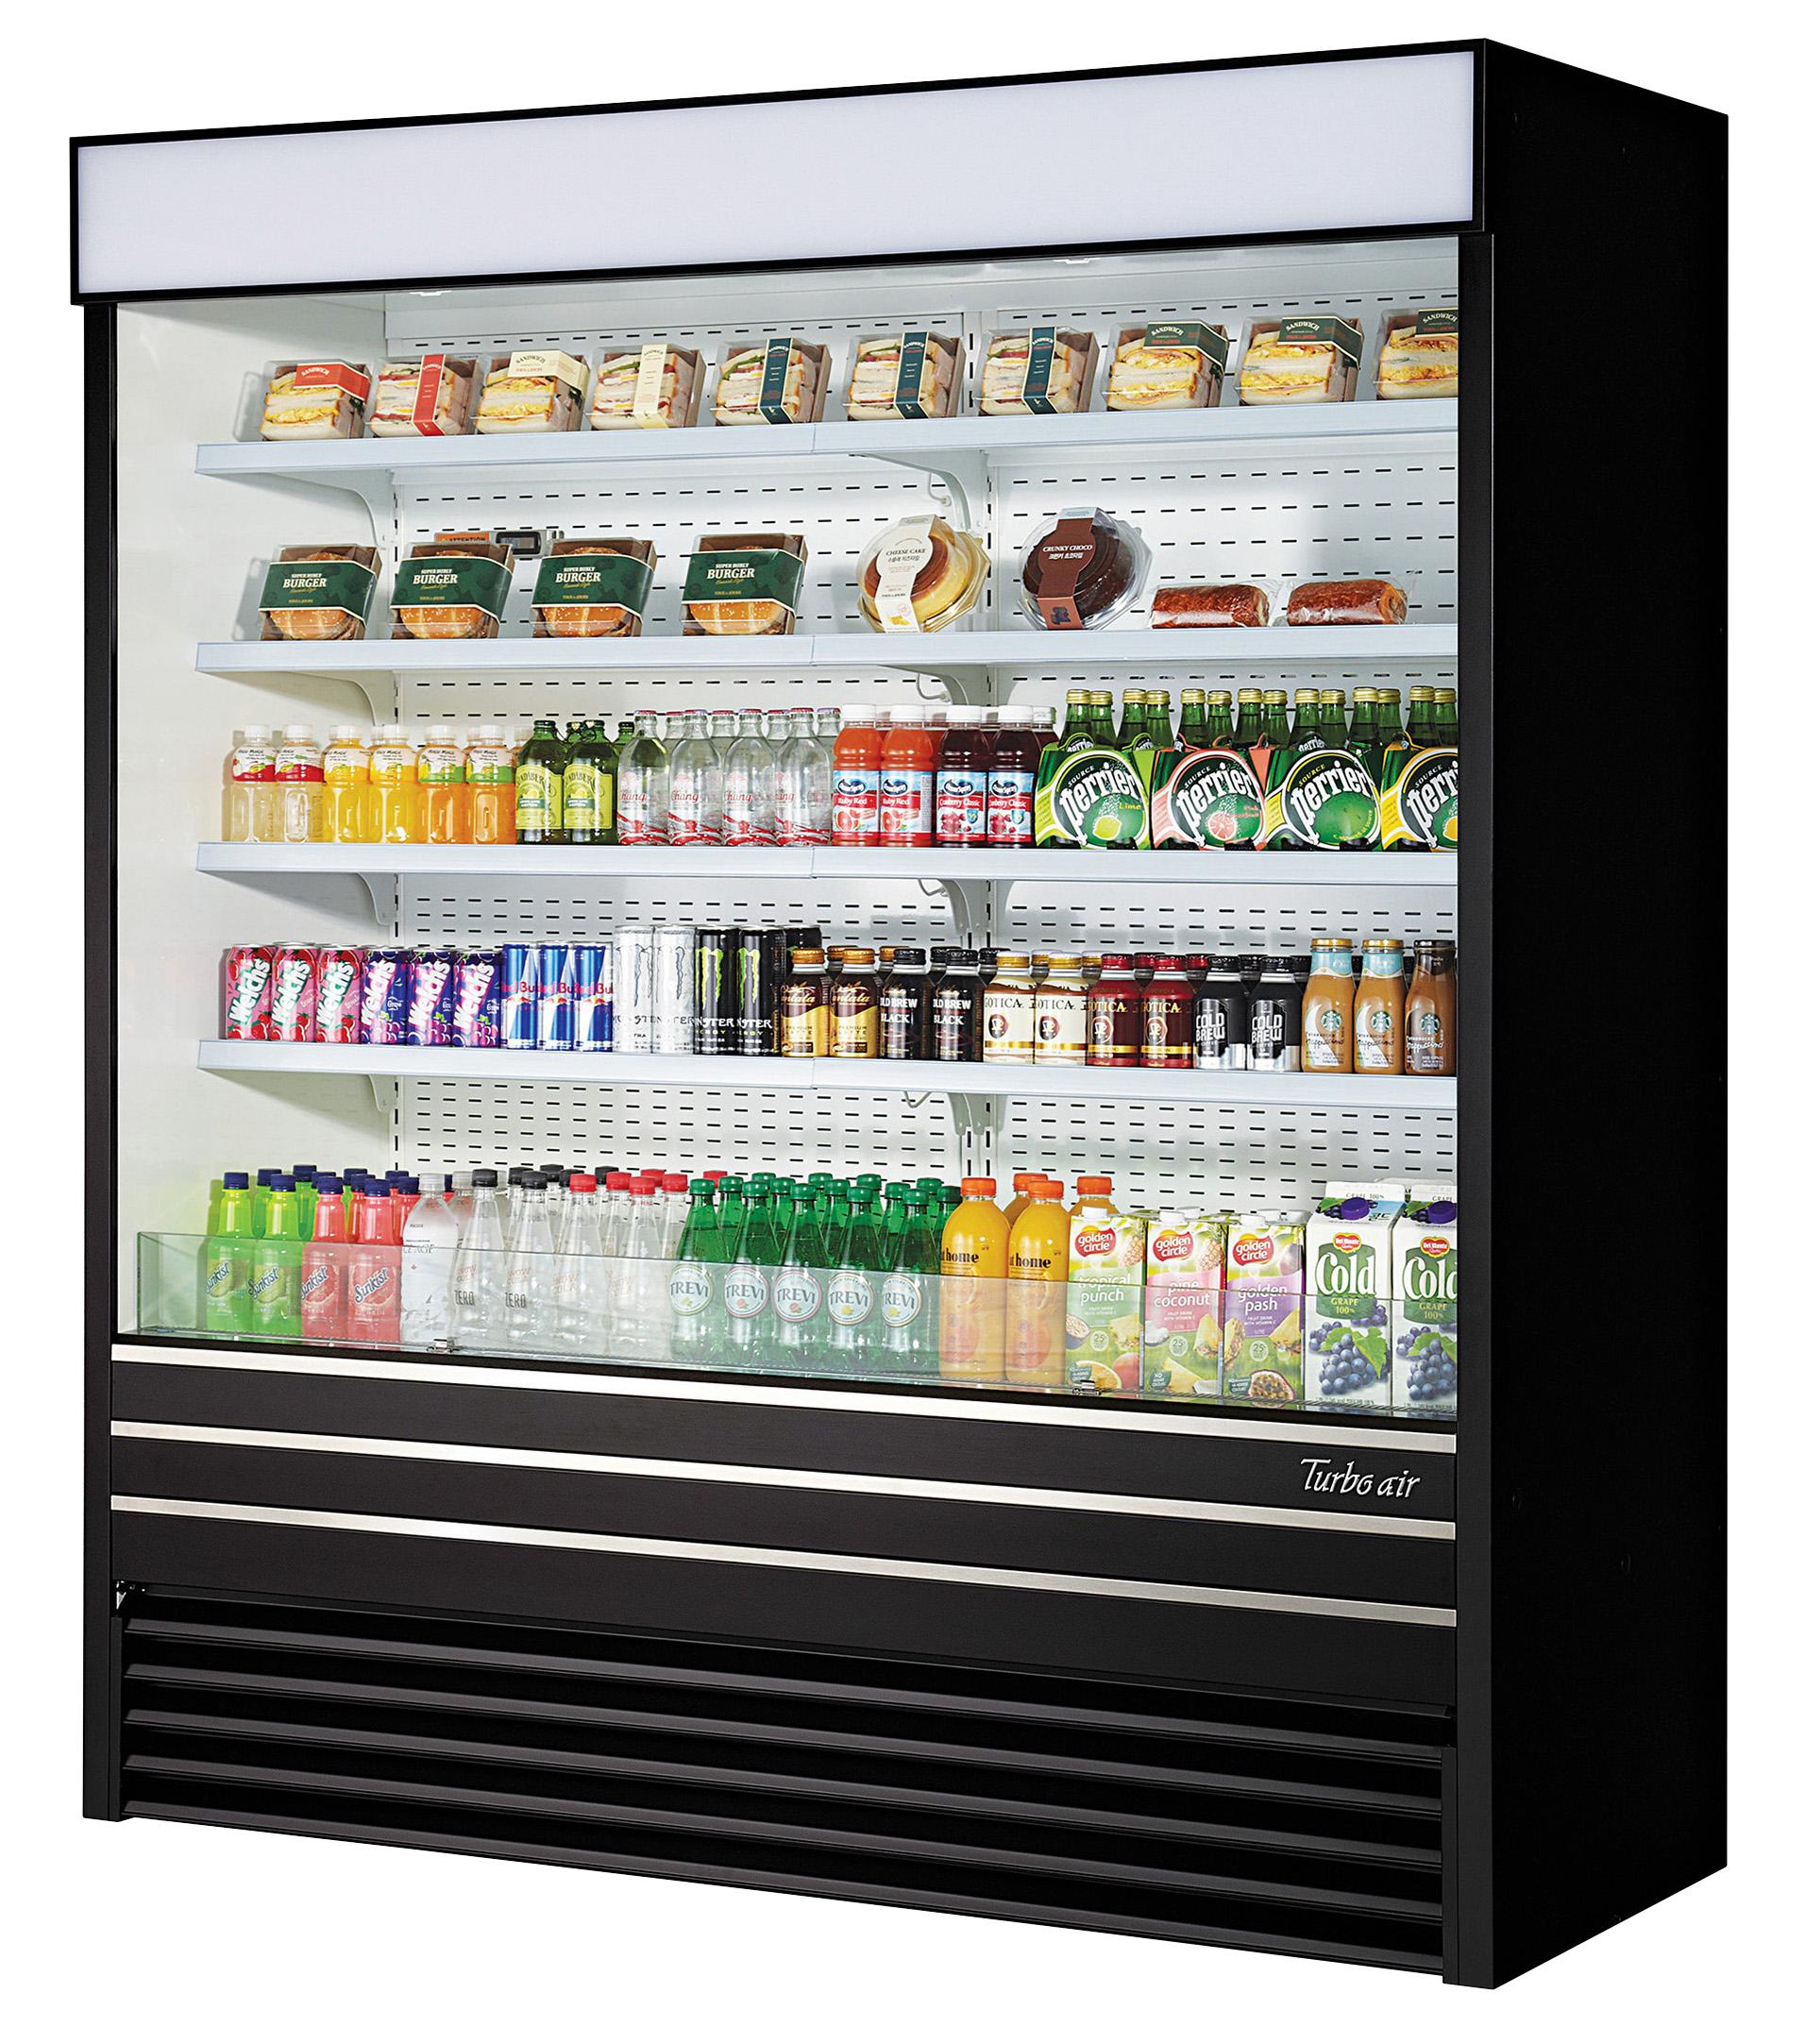 Turbo Air TOM-72EB-N merchandiser, open refrigerated display